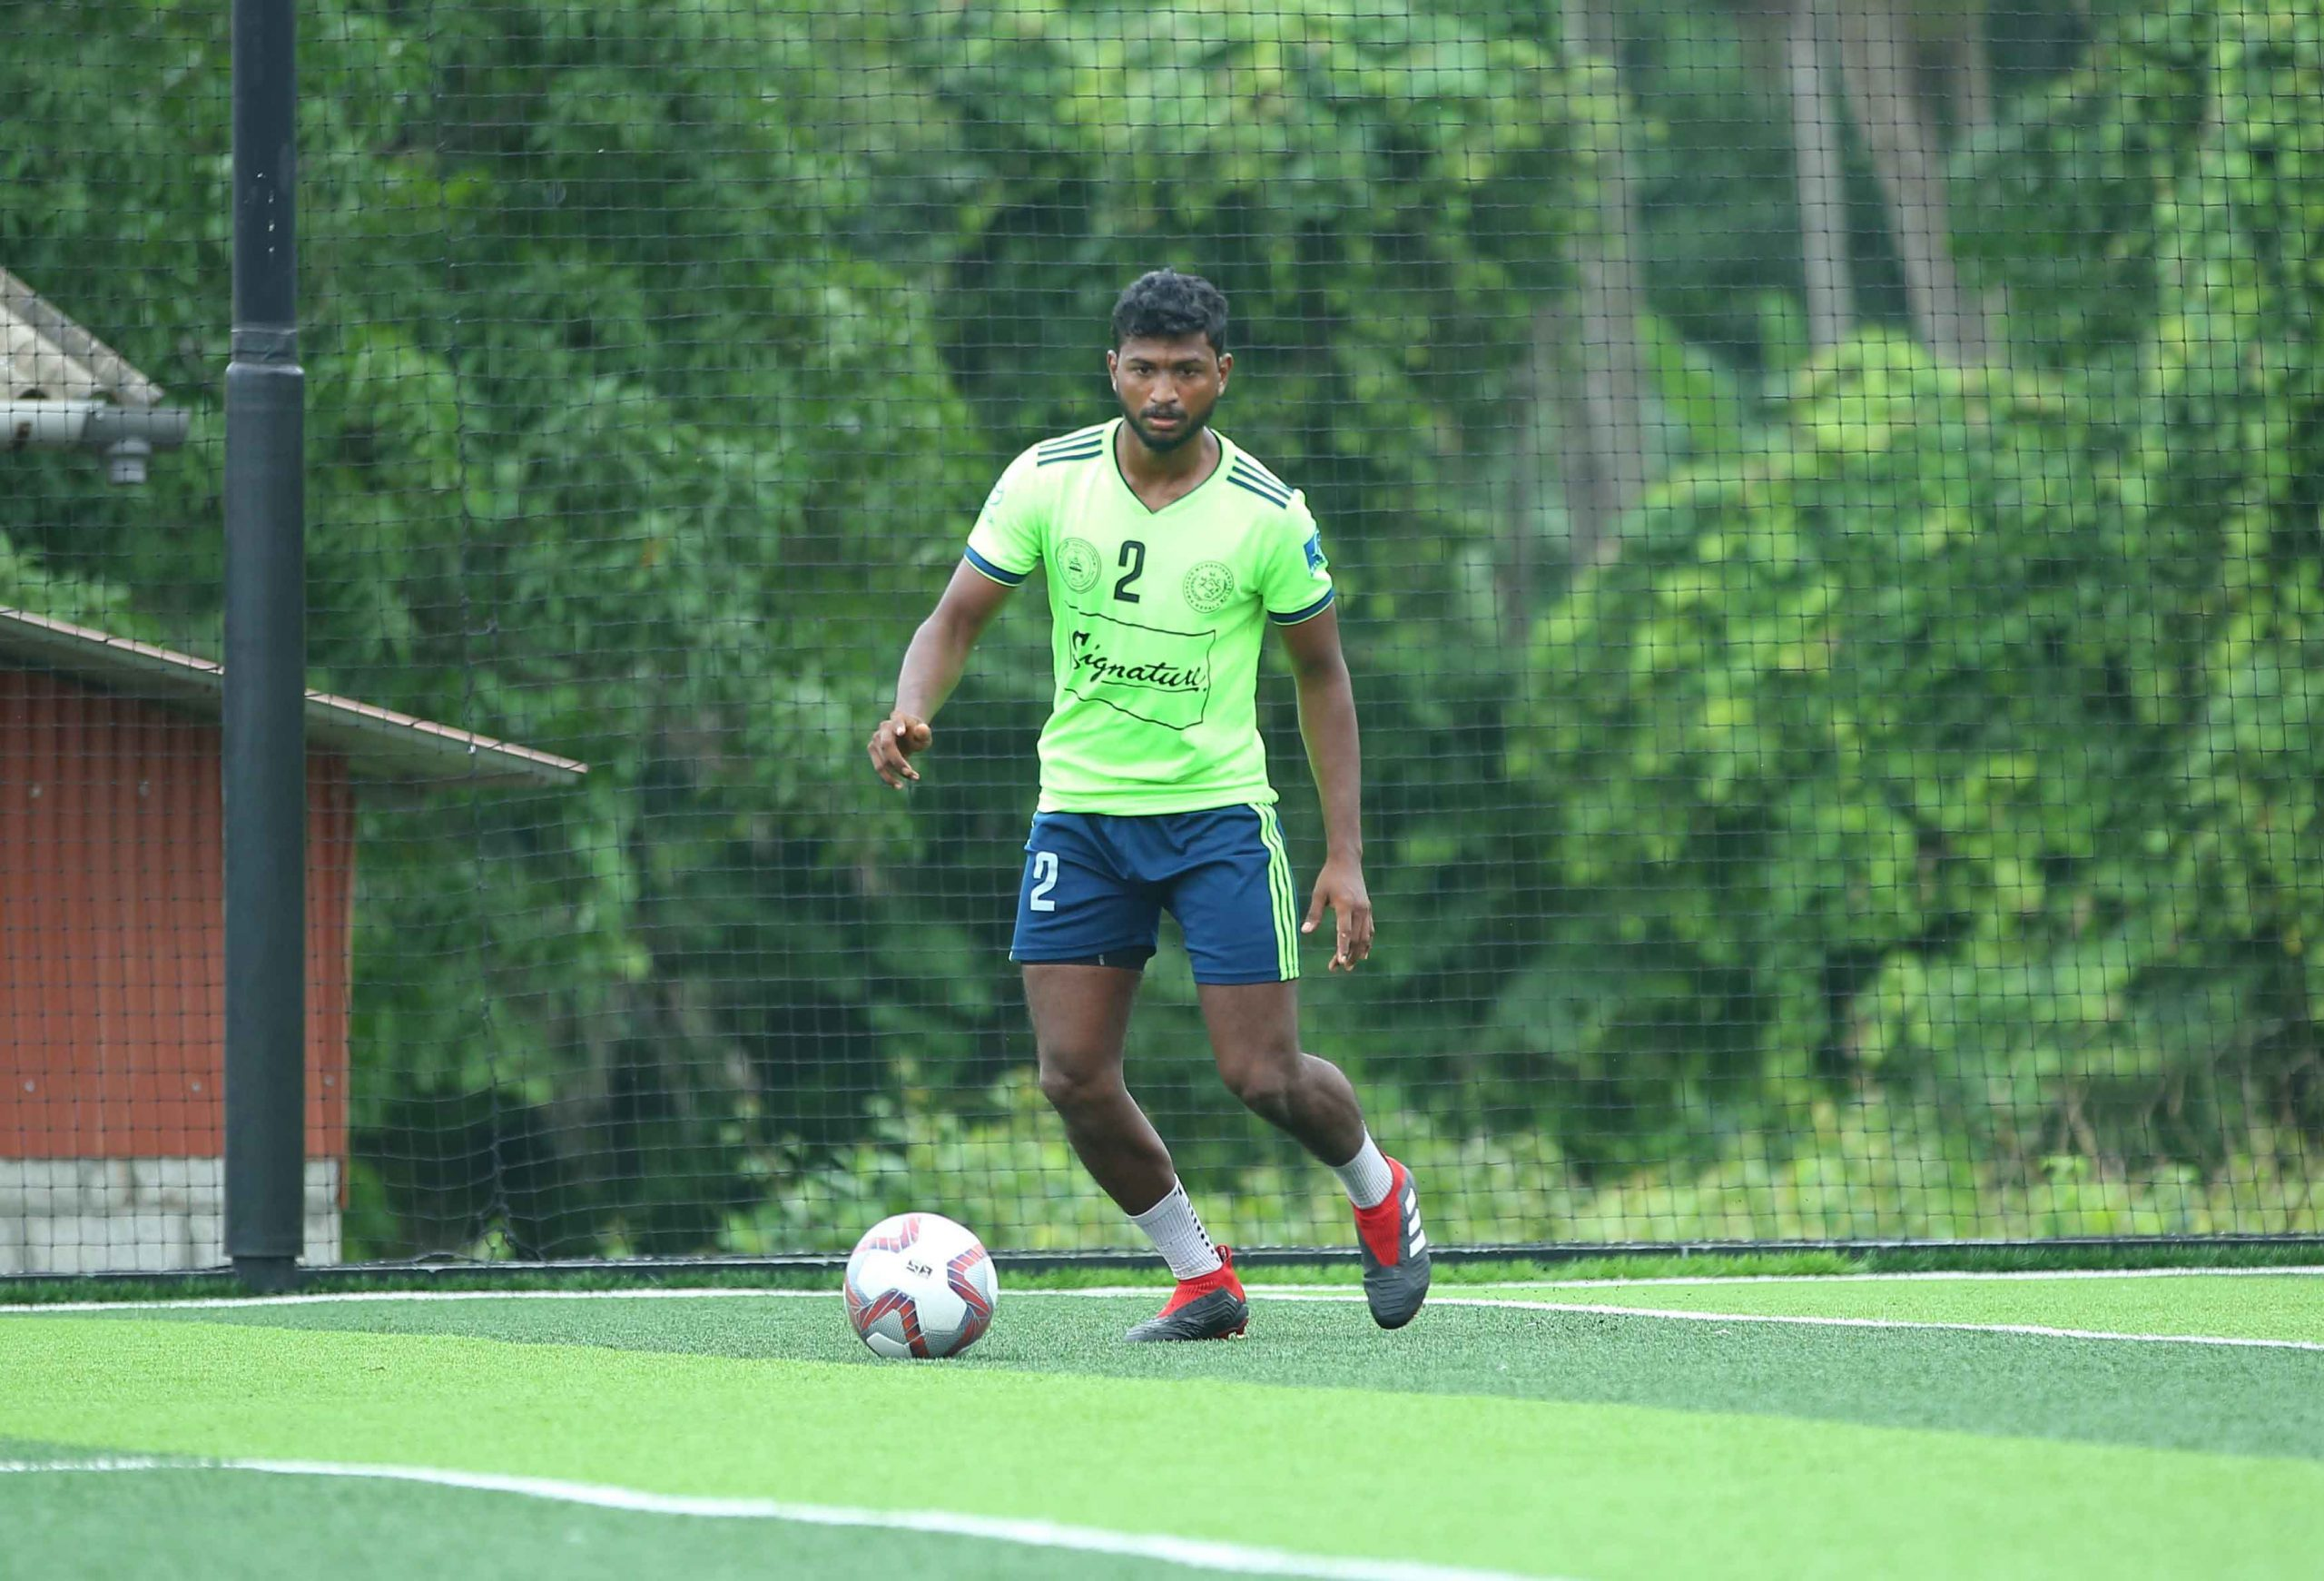 Watching Gokulam lifting Durand Cup gave me goosebumps: Muhammed Asif